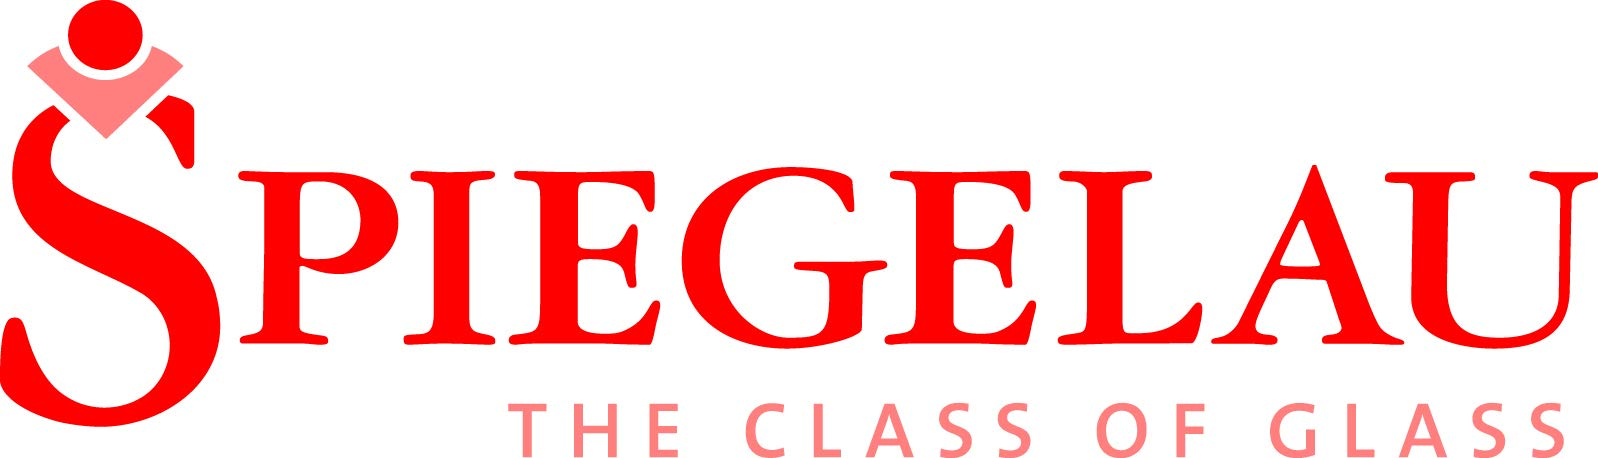 Spiegelau Willsberger Champagne Flute (Set of 4), 8.5 oz, Clear